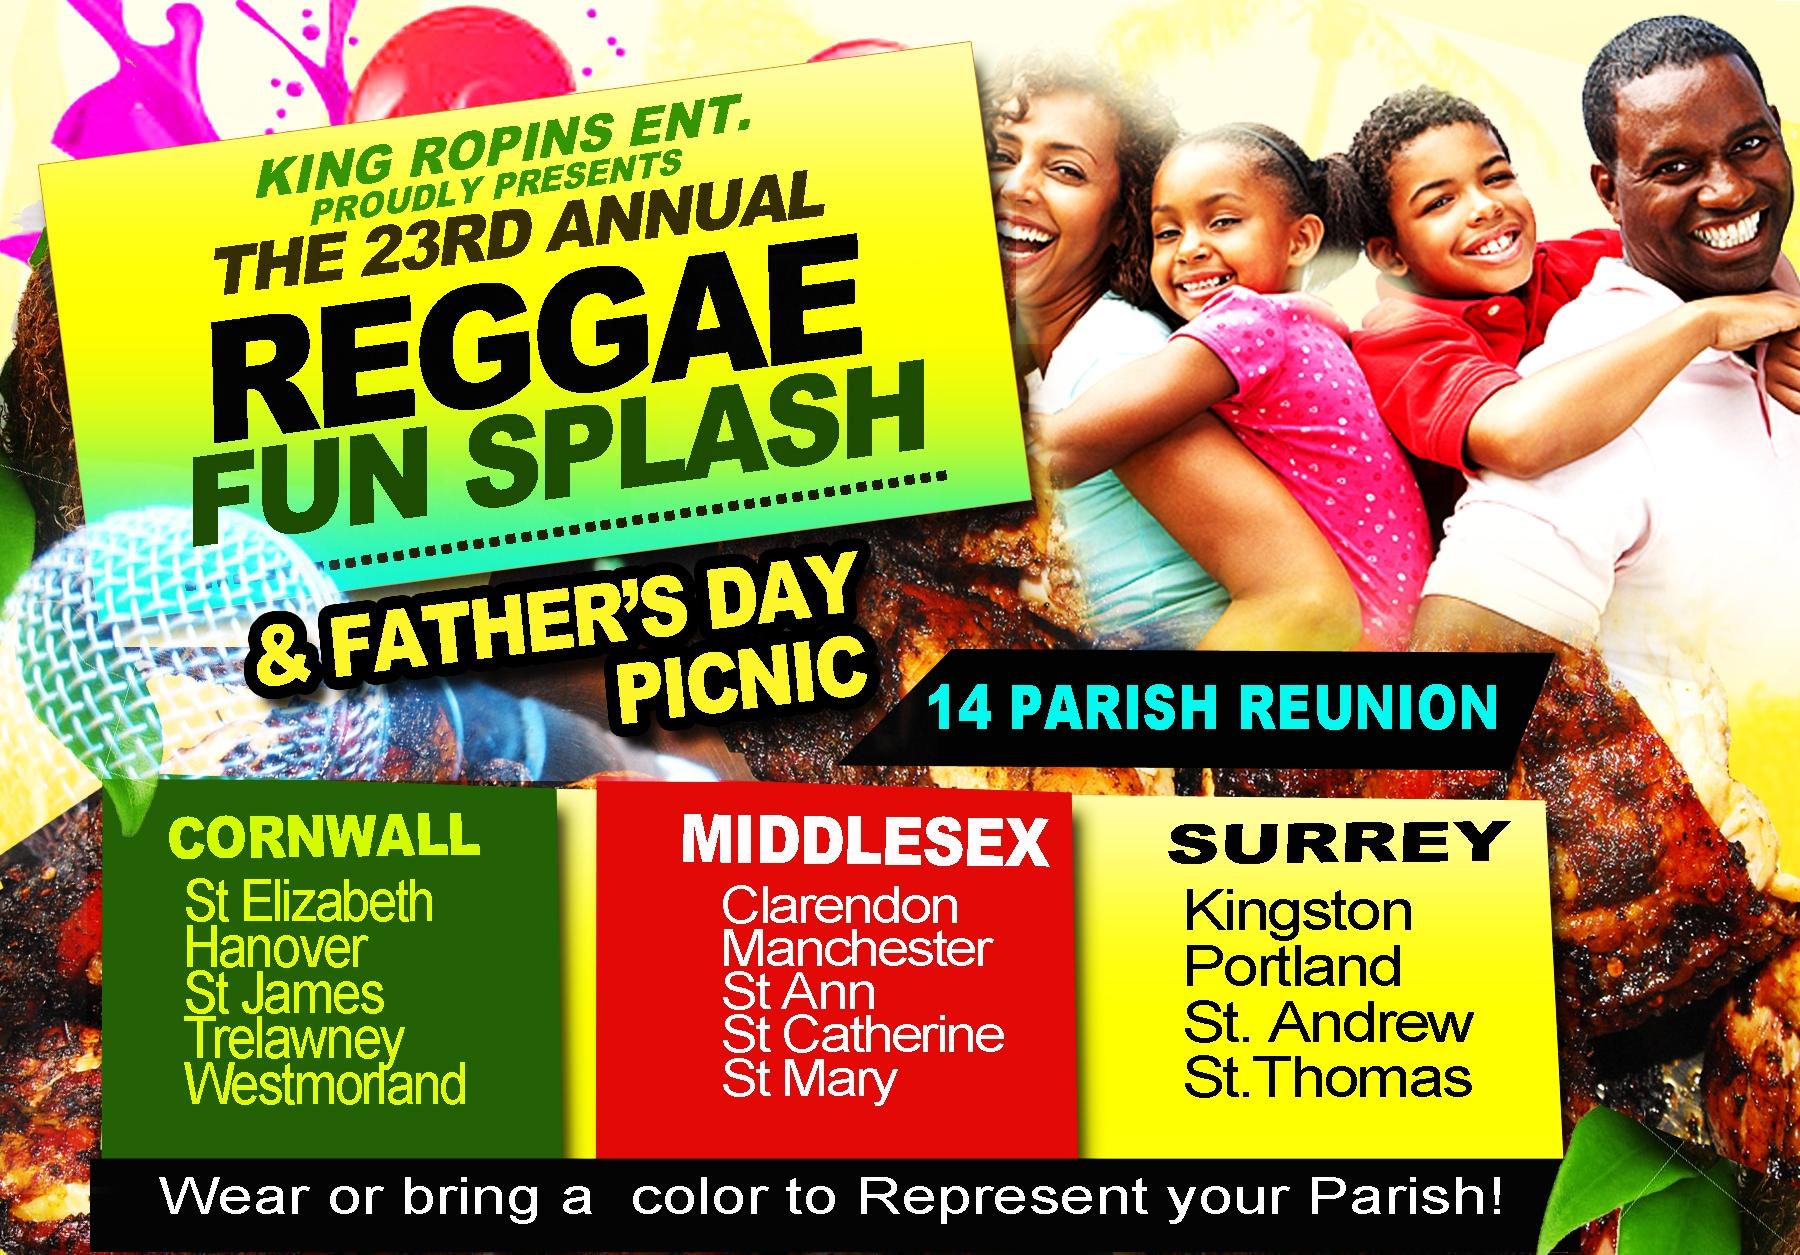 FAMILY FUN SPLASH & FATHER'S DAY PICNIC | Birdie Promotions